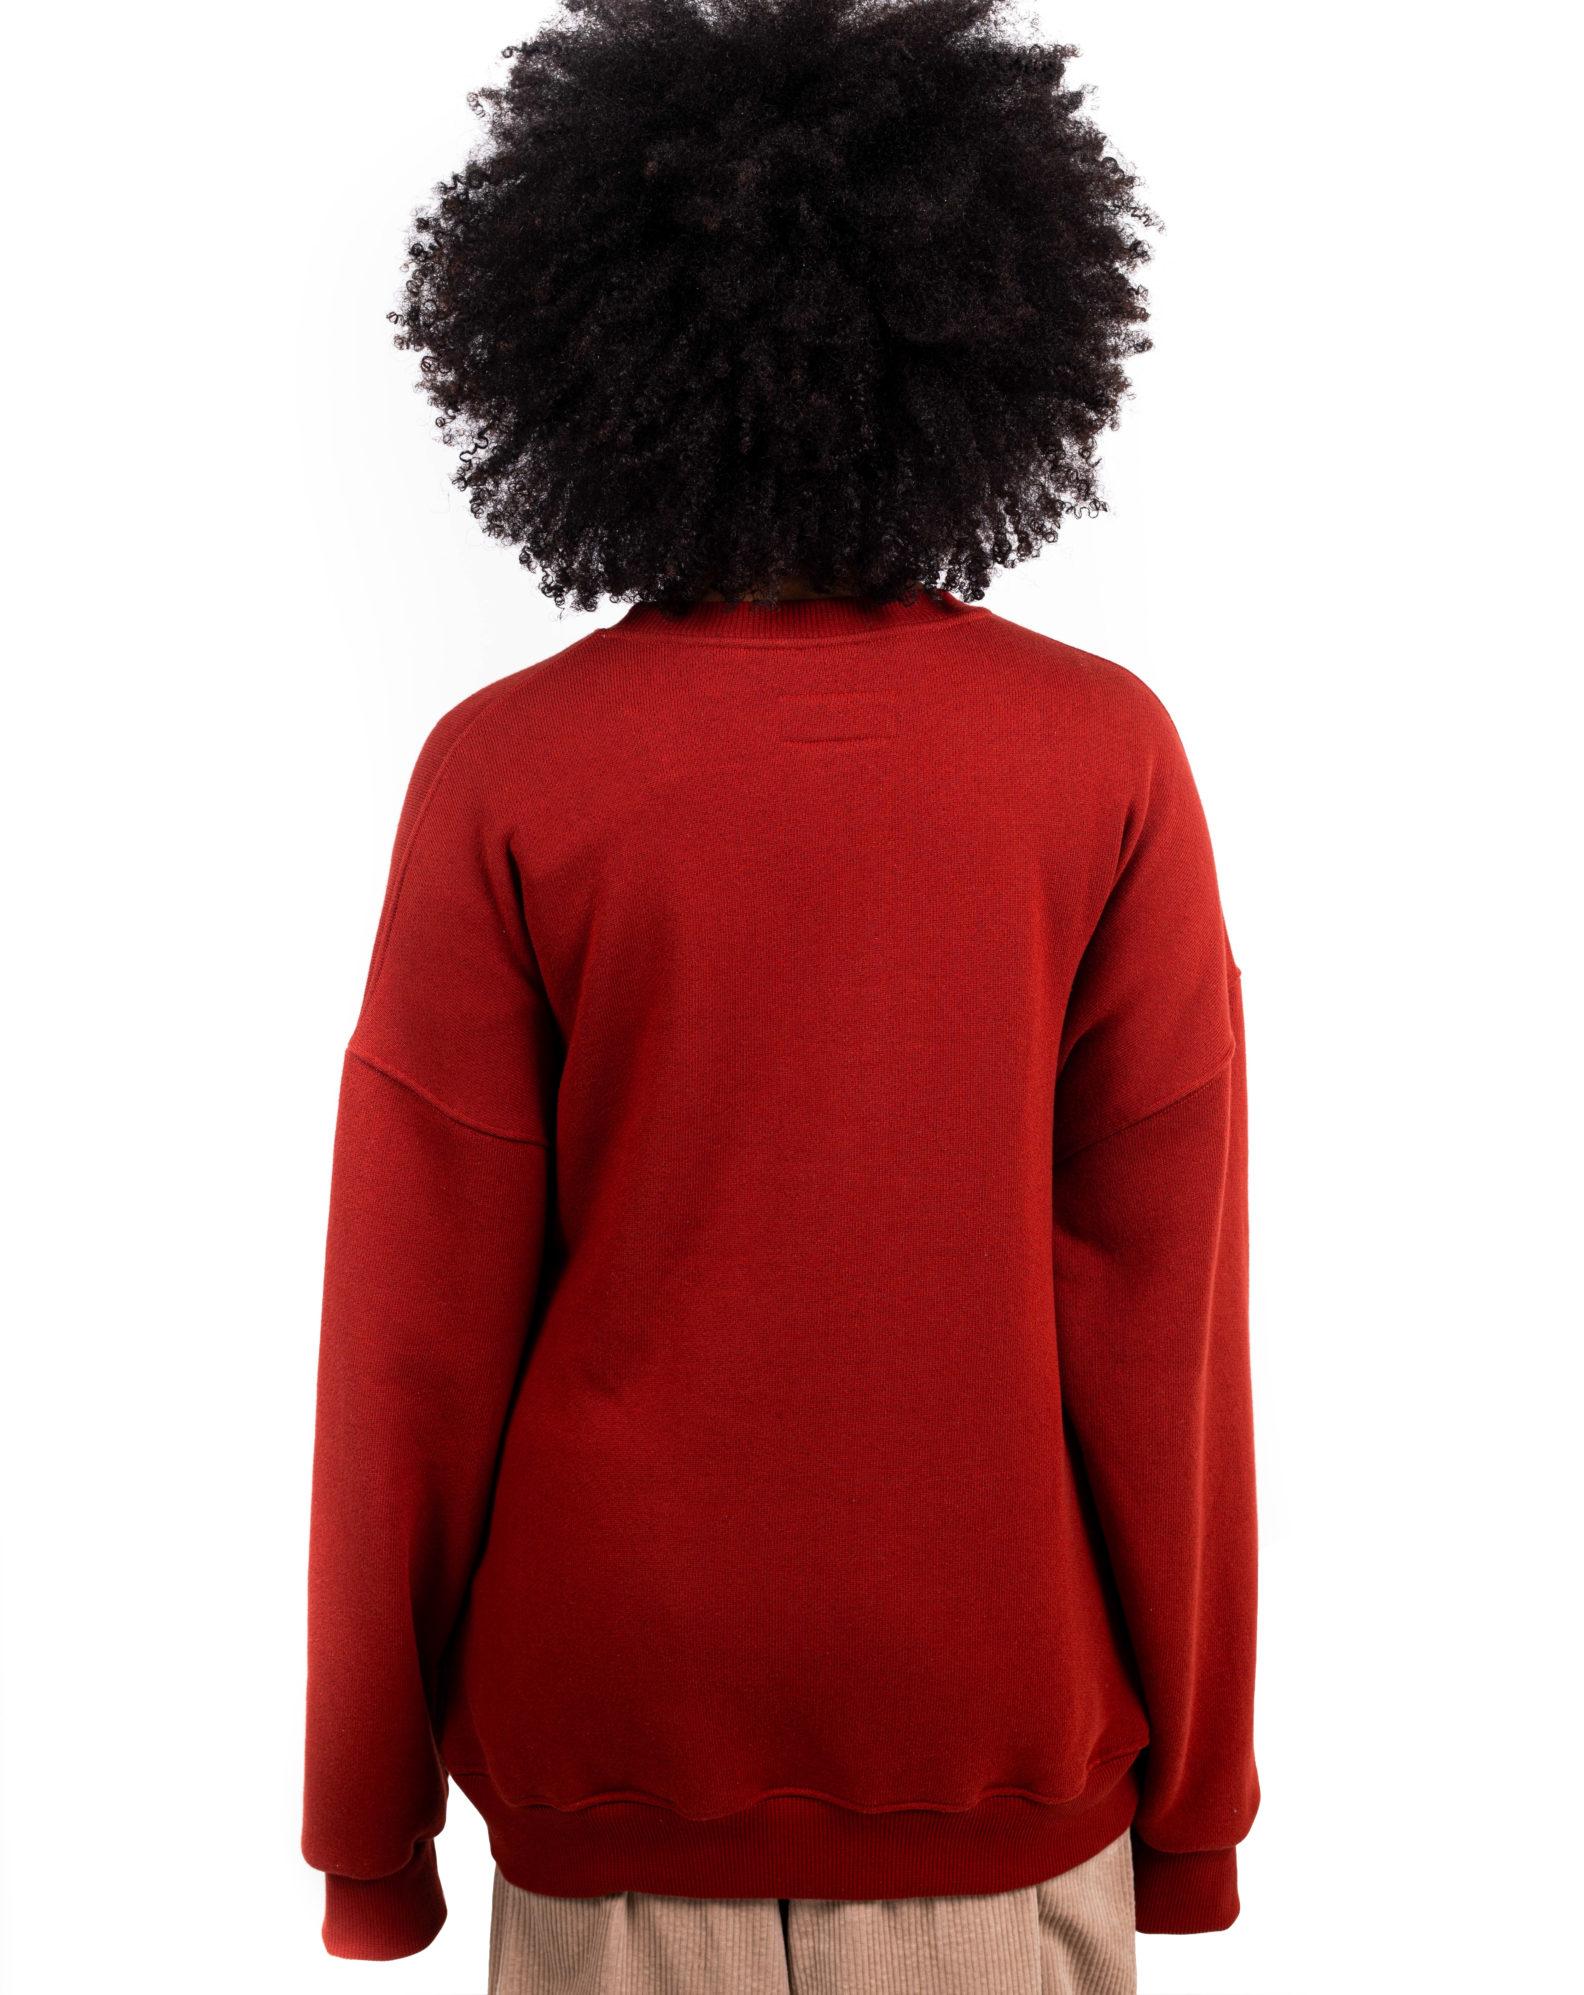 sweatshirt-motif-print-manches-longues-long-sleeves-groundwork-affaires-etrangeres-mode-coreenne-korean-fashion-kpop